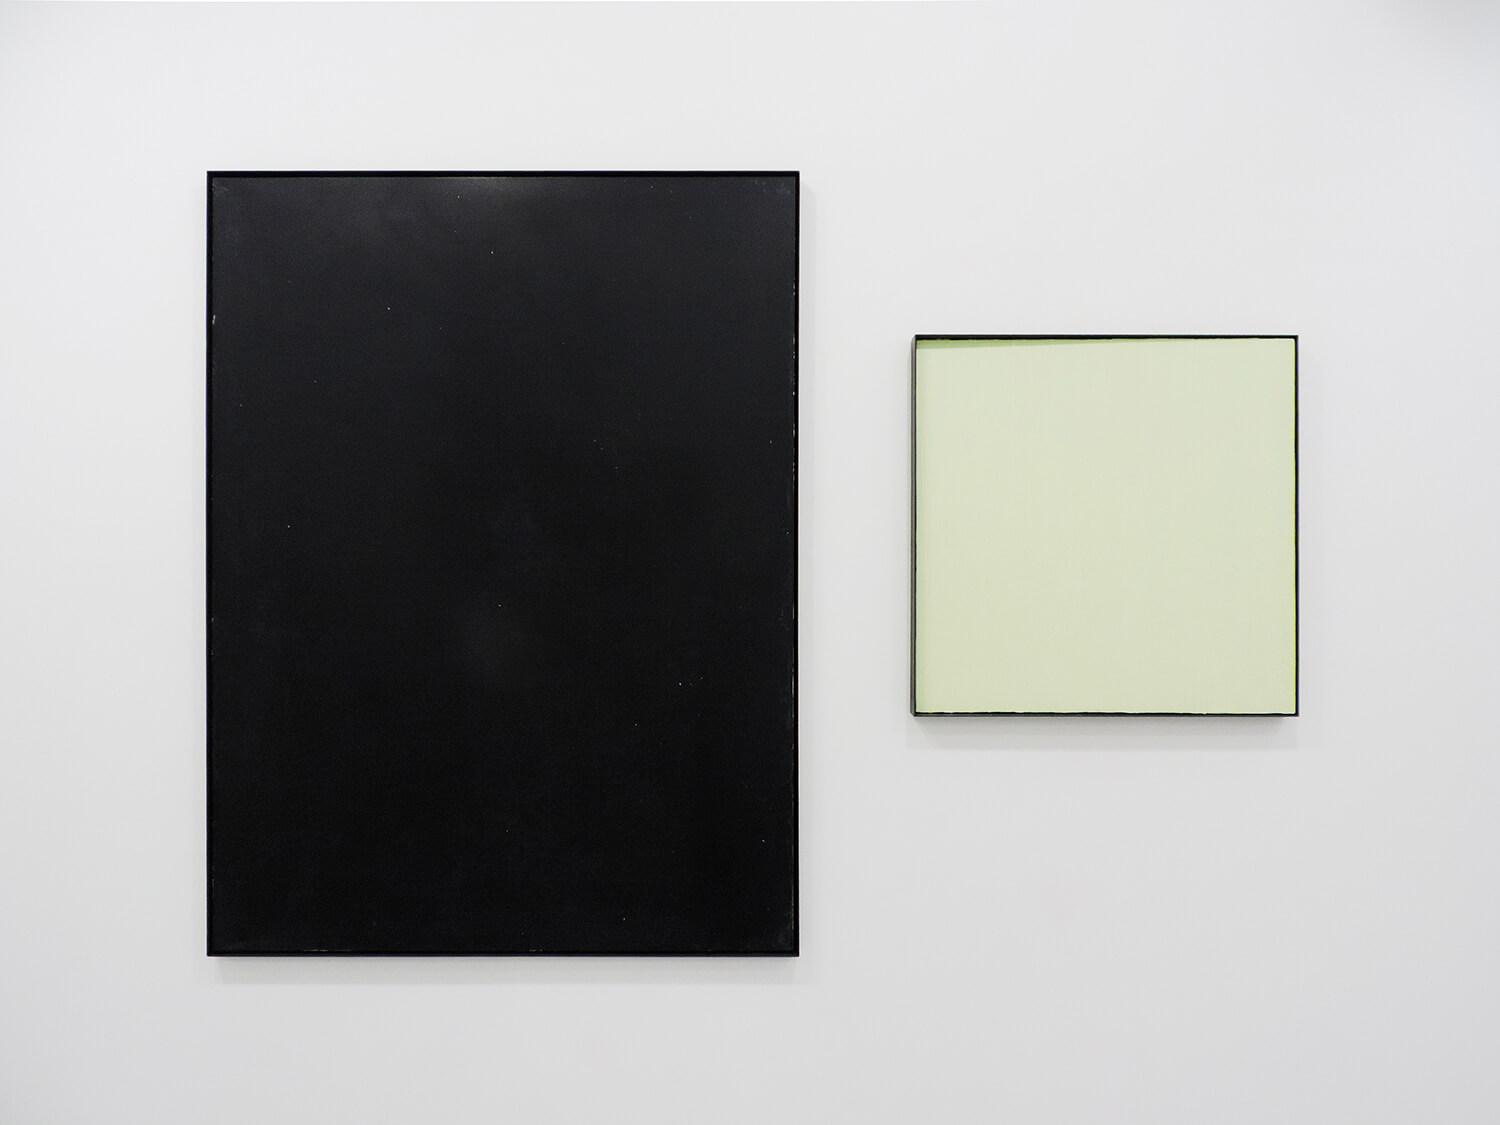 <b>black board</b> 木製パネルに綿布、黒板塗料、鉄製フレーム 1234 × 930 mm 2009(左)<br><b>縦方向の線で構成される四角形</b> パネルにアクリル絵の具、蓄光粉末、鉄製フレーム 600 × 600 × 40 mm 2014(右)